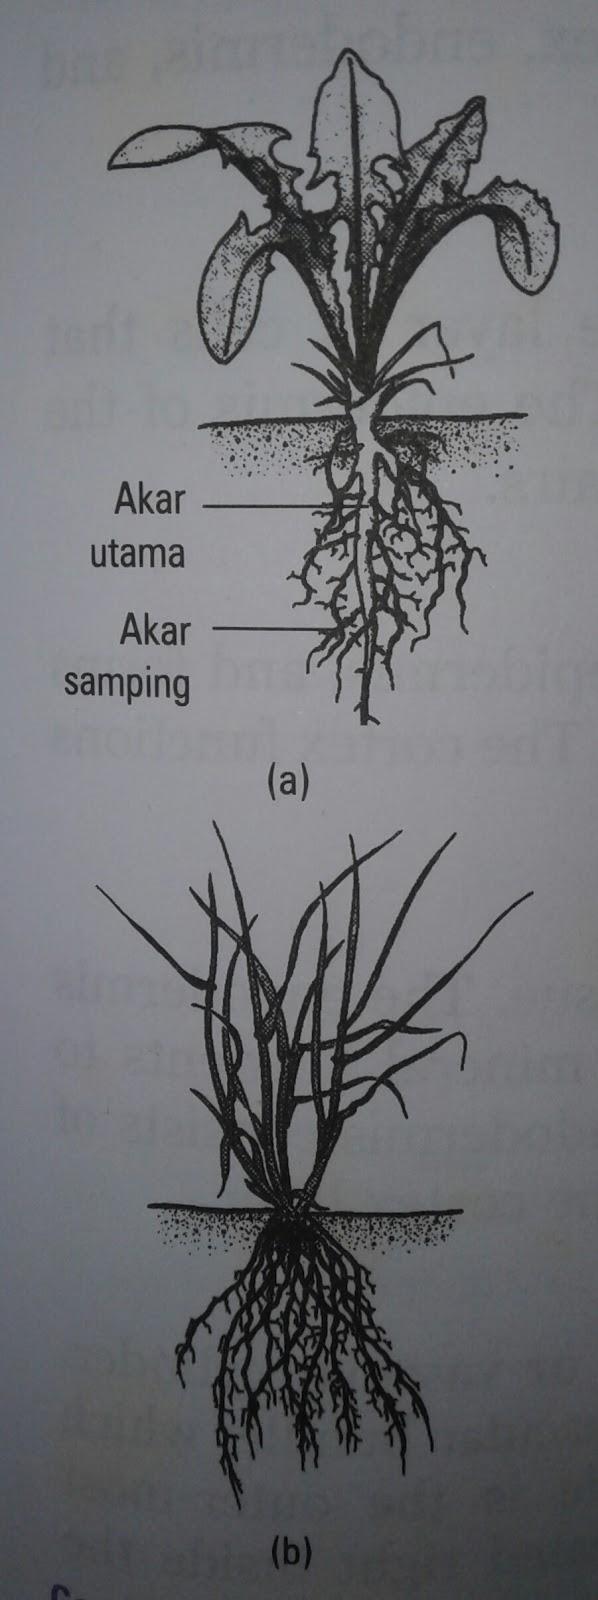 Struktur Dan Fungsi Tubuh Tumbuhan Akar Batang Daun Struktur Luar Dan Dalam Biologi Ayok Belajar